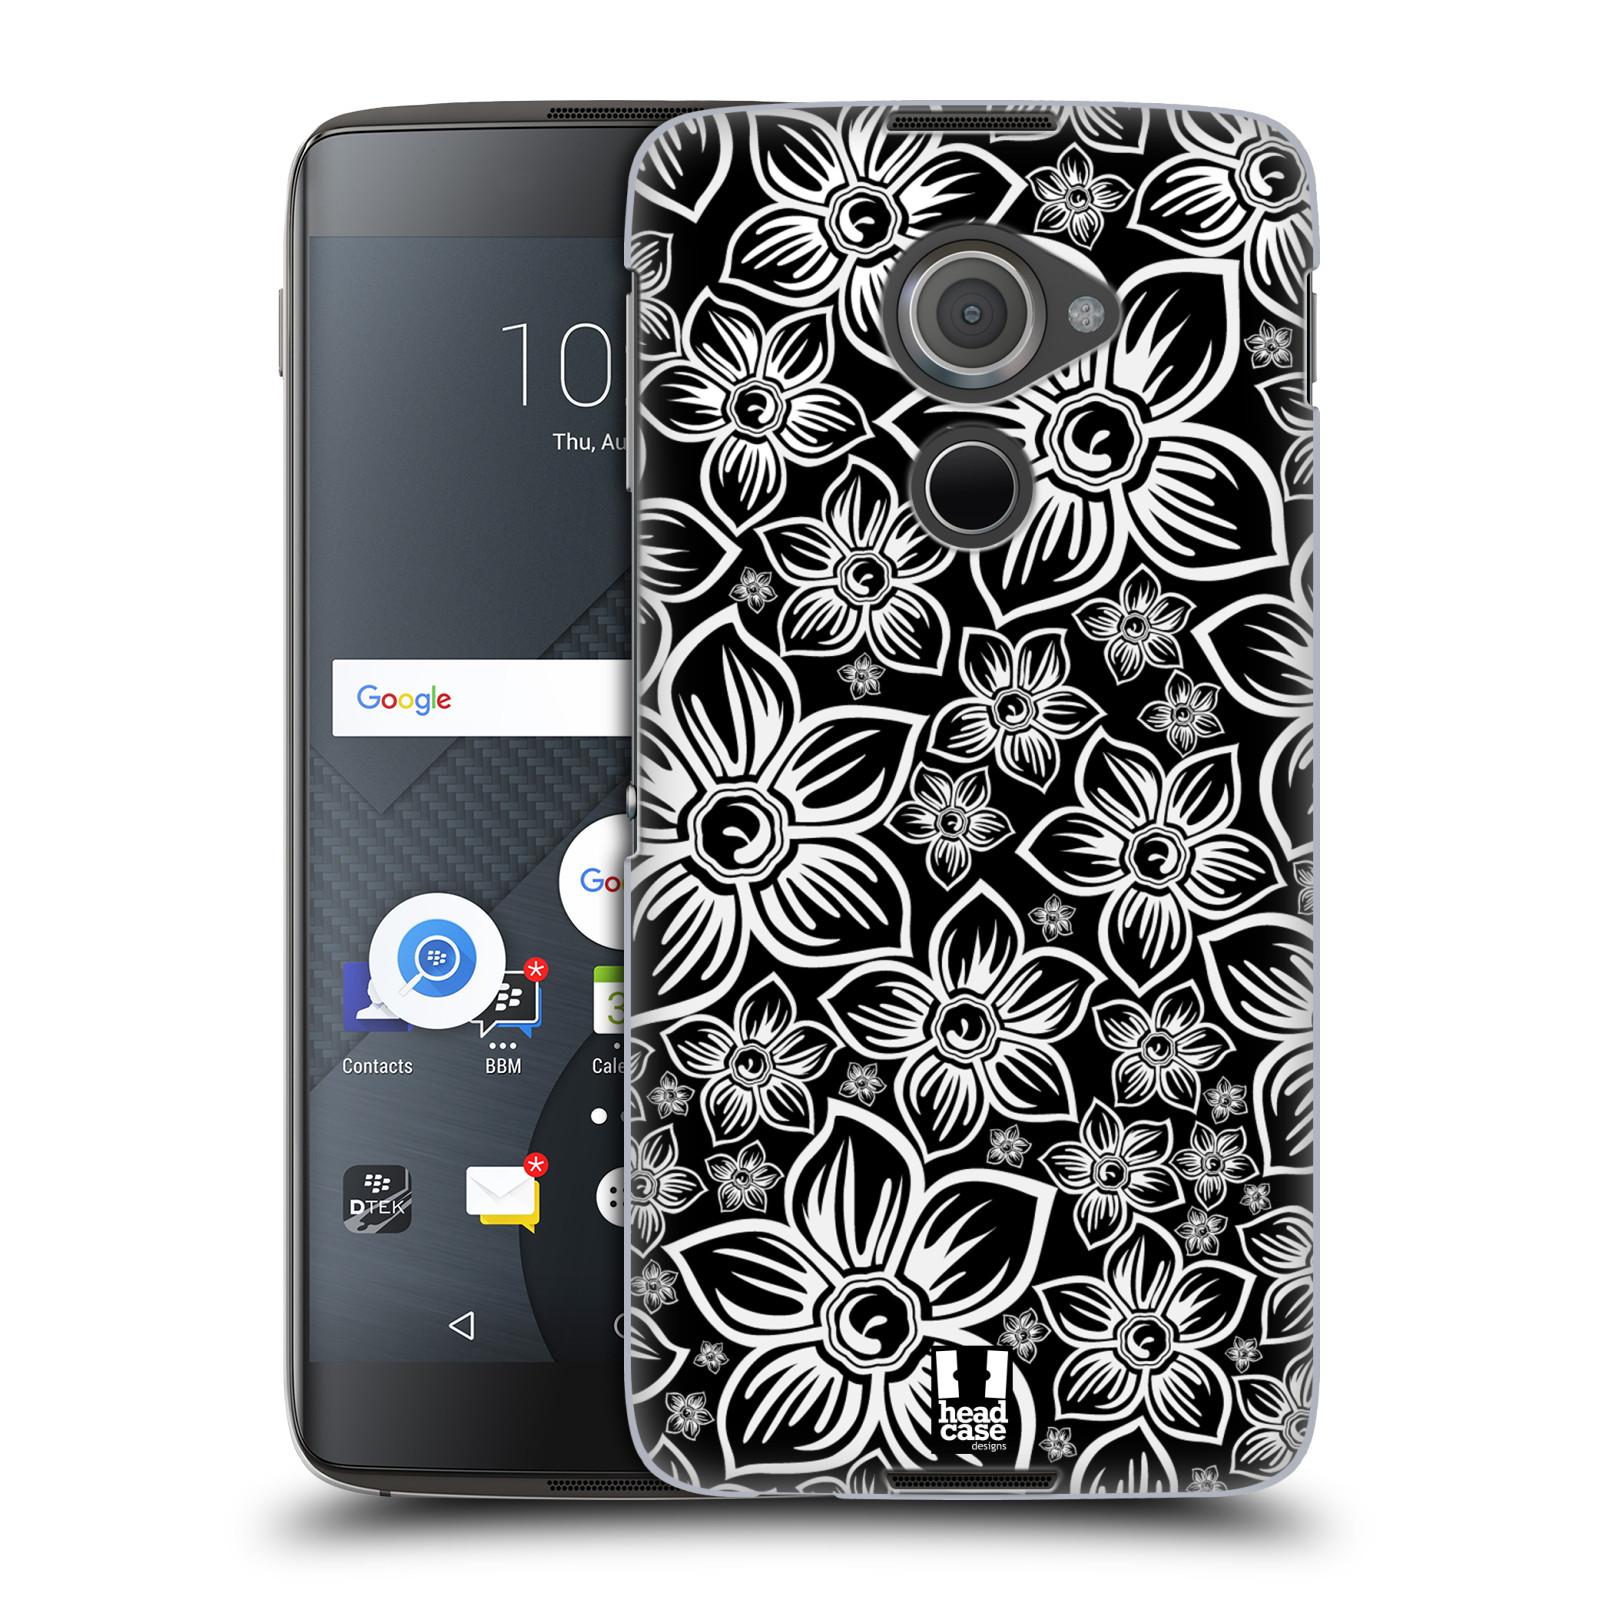 Plastové pouzdro na mobil Blackberry DTEK60 (Argon) - Head Case FLORAL DAISY